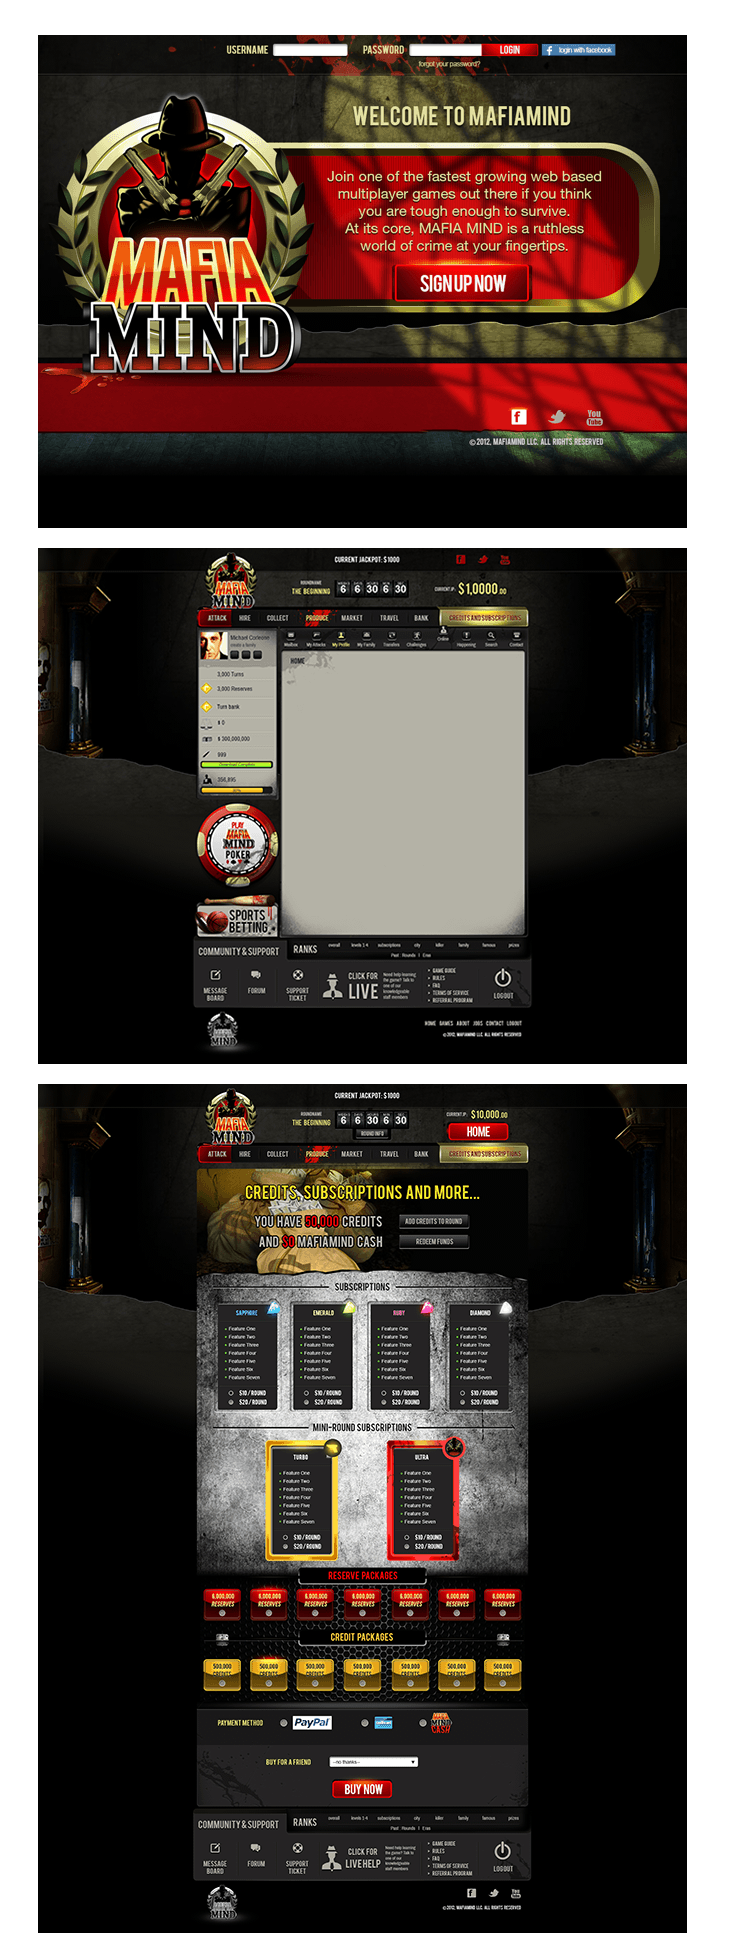 www.lanotdesign.com #Mafia_Mind #website #design #mafia #mob #online_game #gang #lanotdesign #manila #philippines